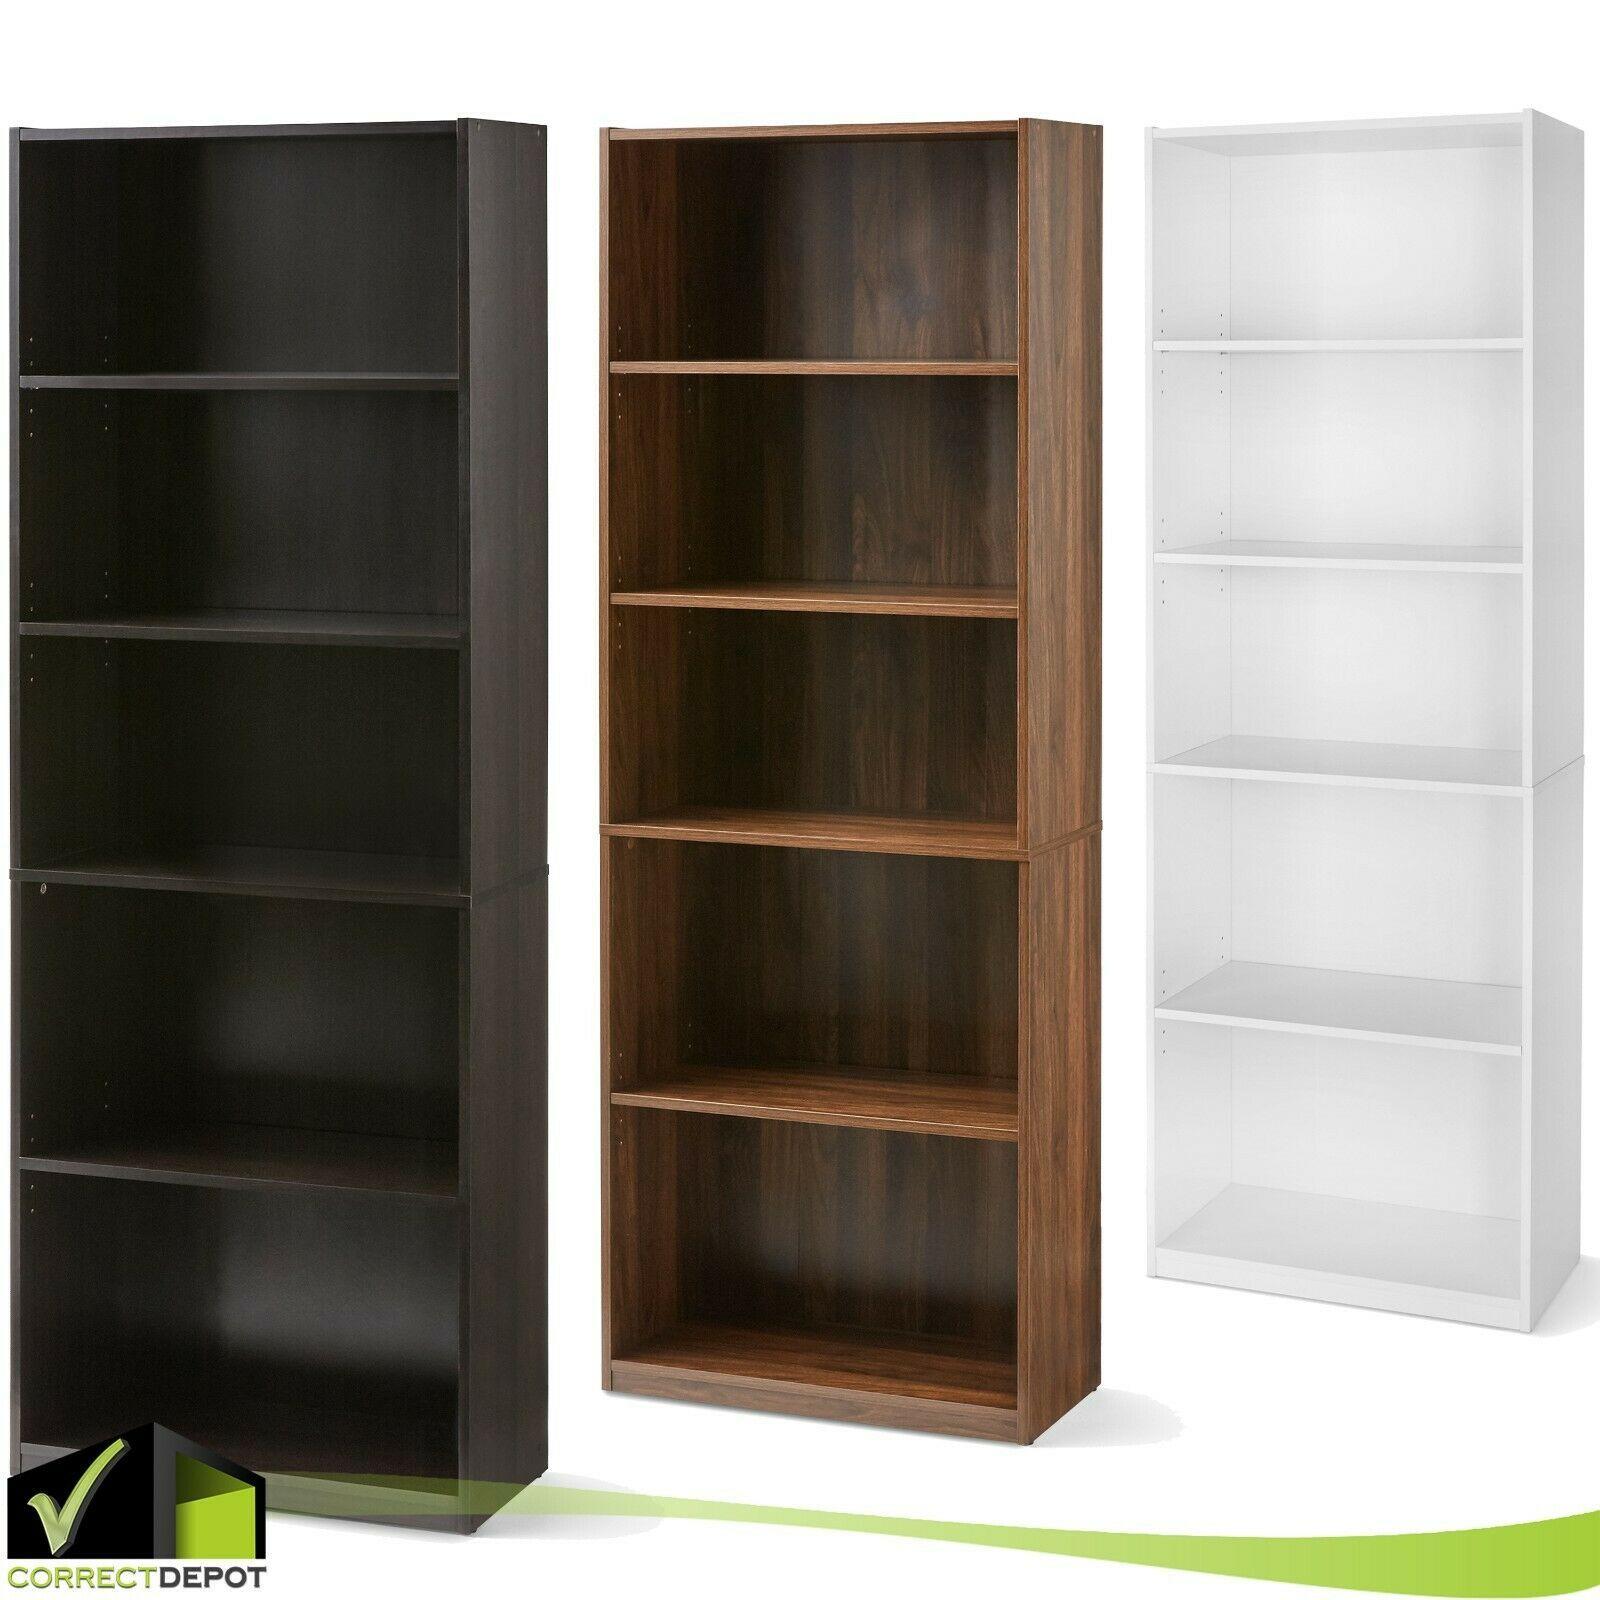 Details About Adjustable 5 Shelf Wood Bookcase Storage Shelving Book Wide Bookshelf Furniture In 2020 Shelves Bookcase Storage Furniture Bedroom